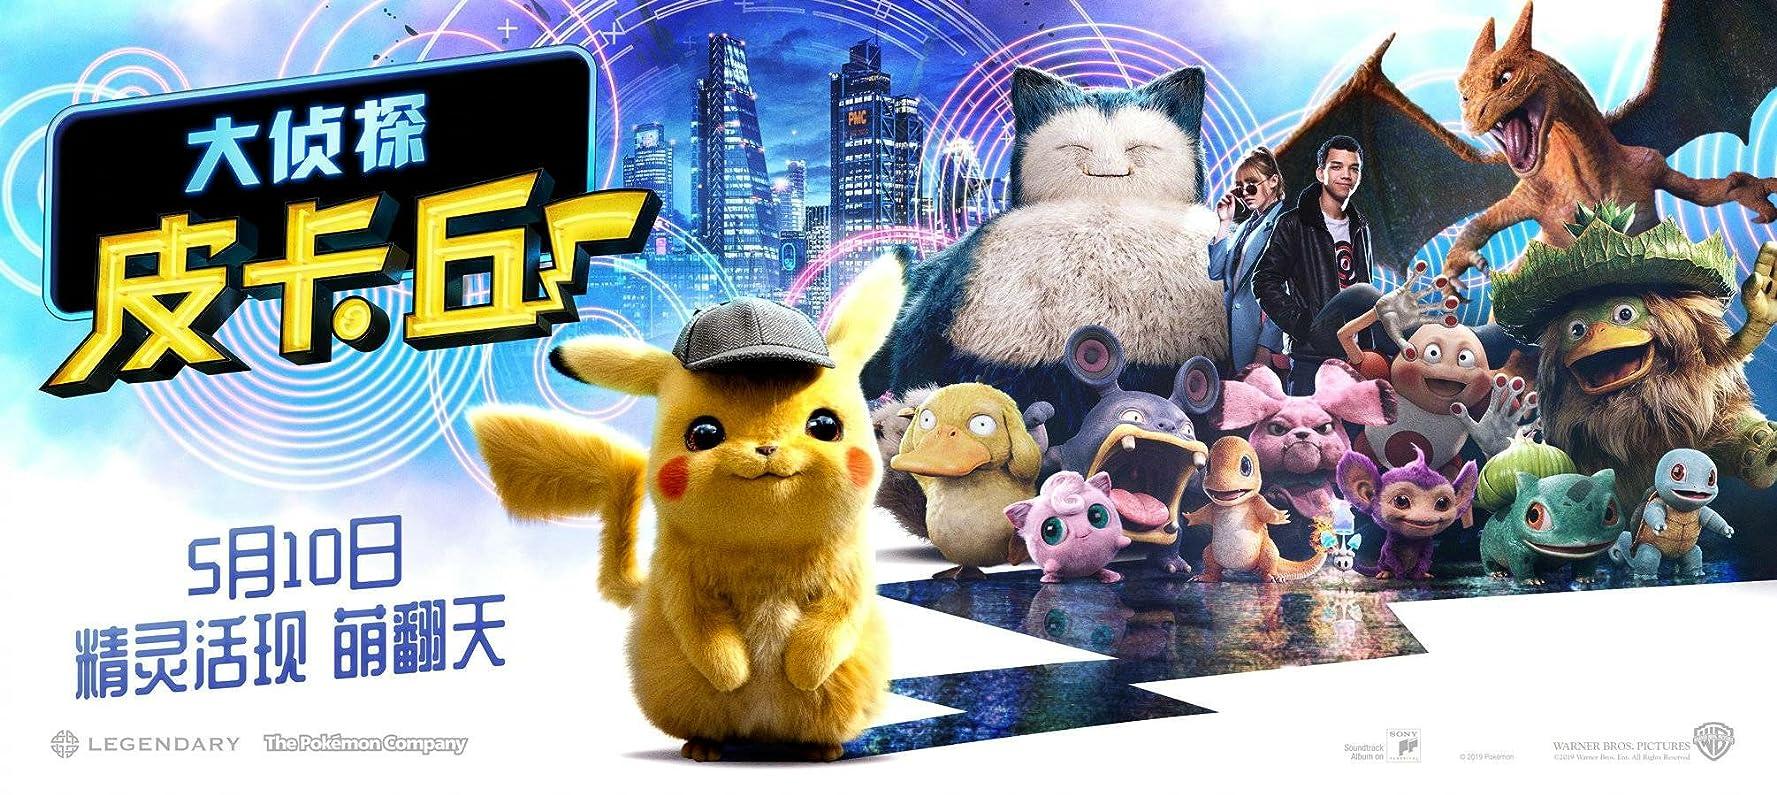 Ryan Reynolds, Kathryn Newton, and Justice Smith in Pokémon Detective Pikachu (2019)